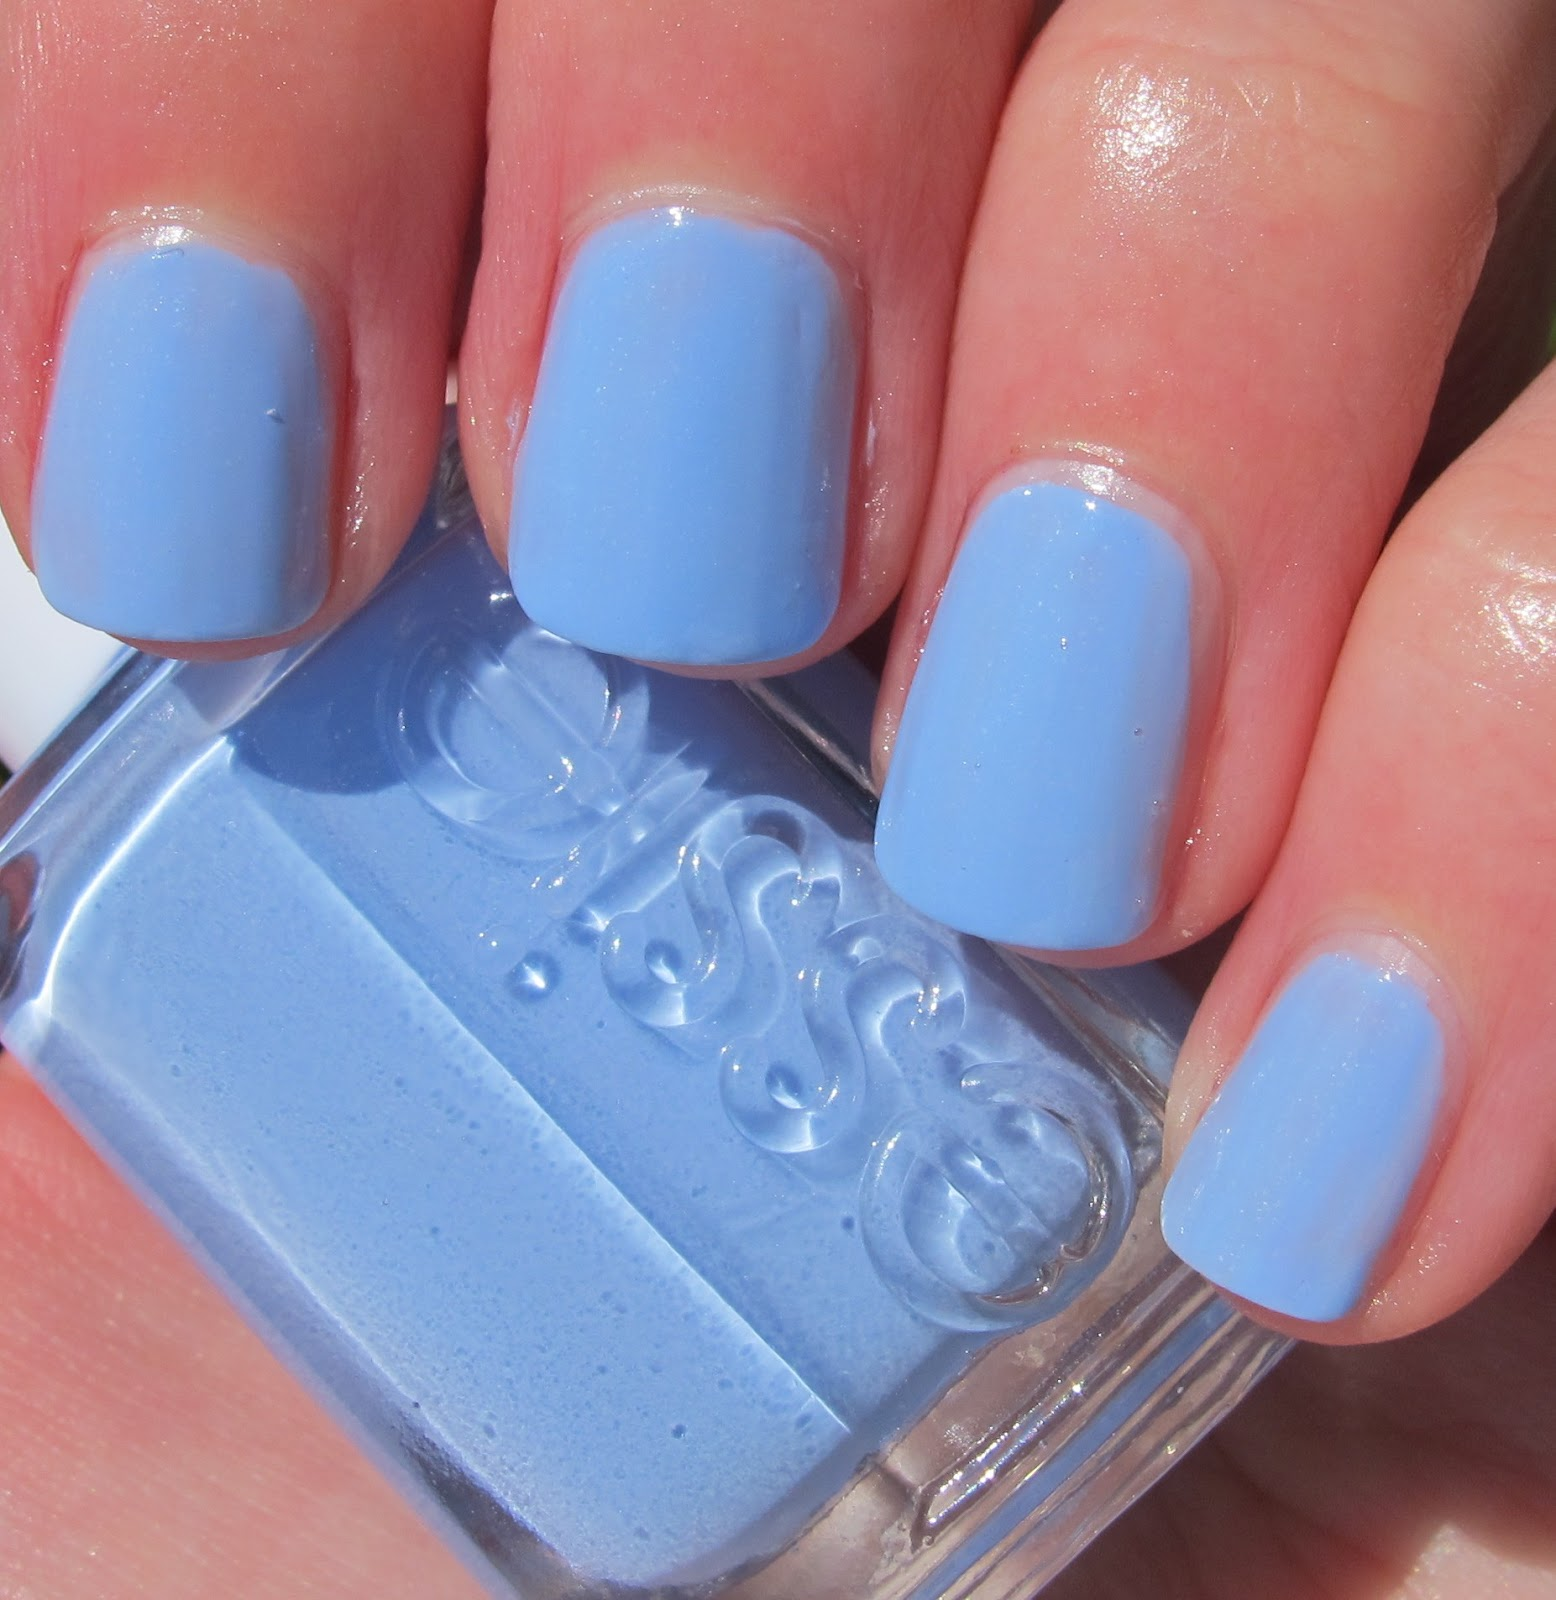 Blue Nail Polish Names: Never Enough Nails: Essie Bikini So Teeny... What's In A Name?